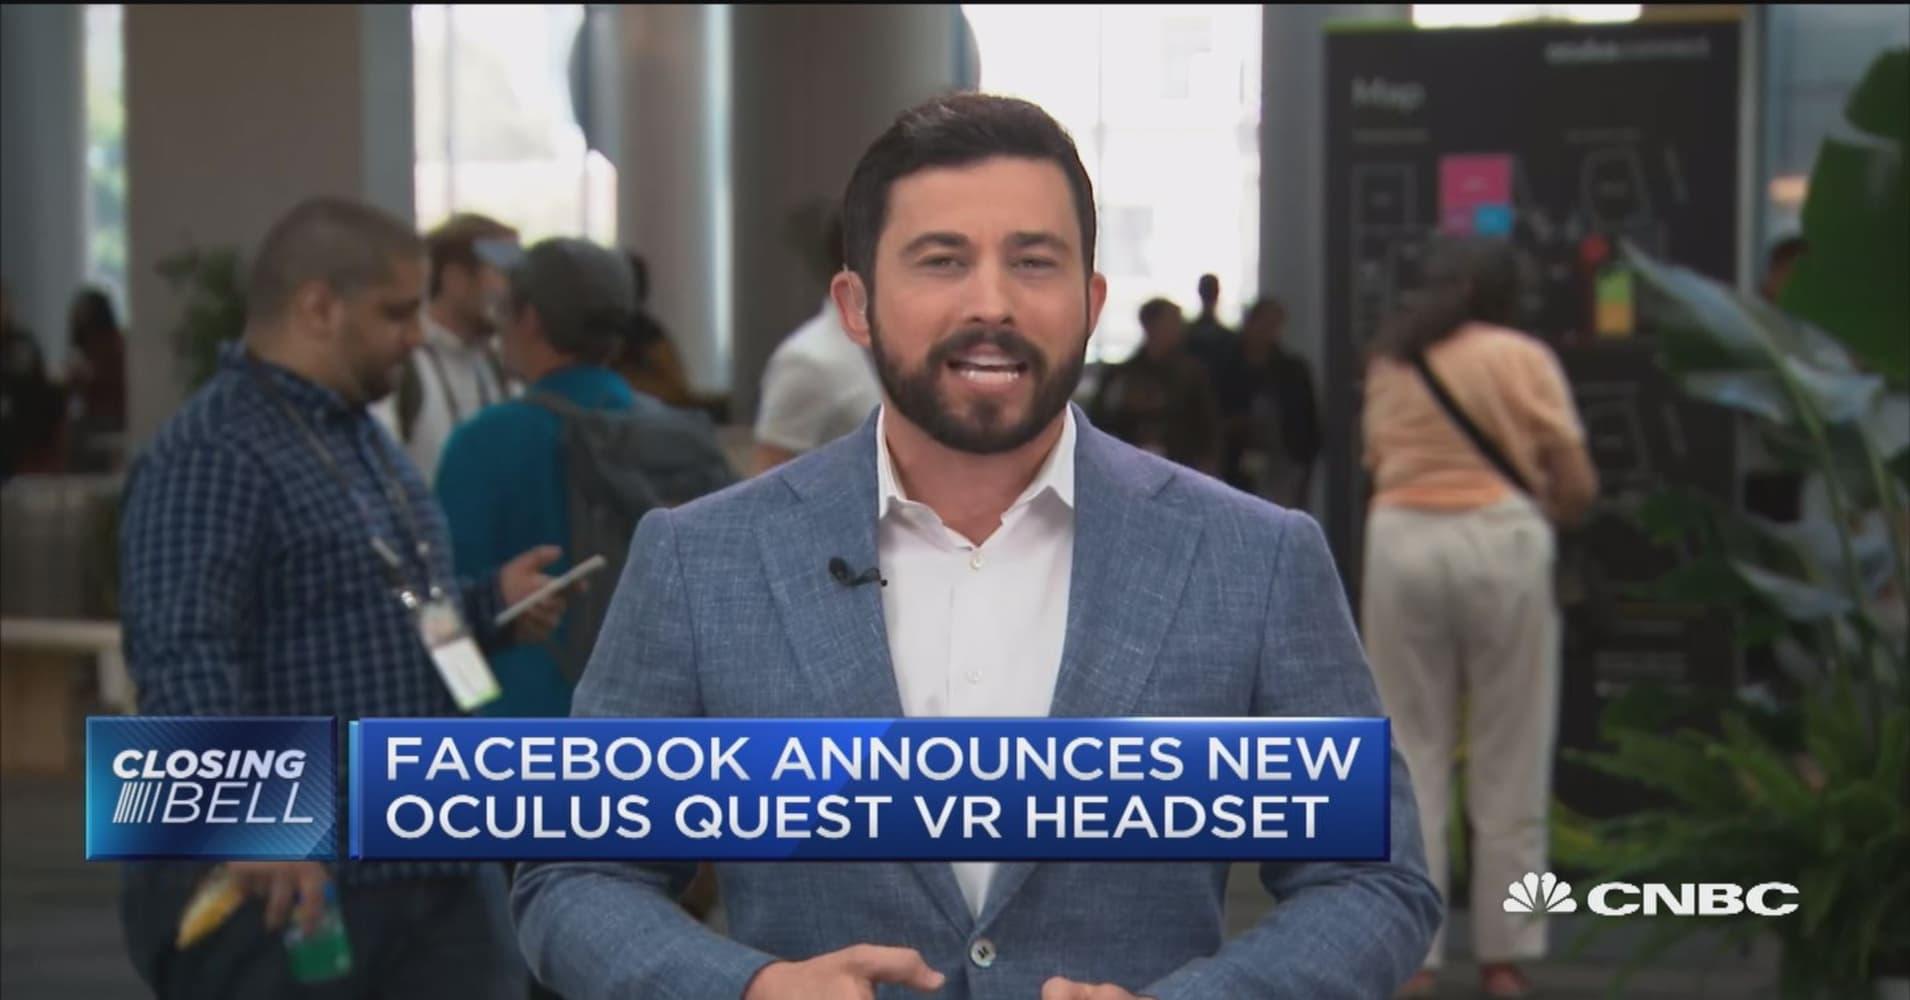 Facebook announces new Oculus Quest VR headset